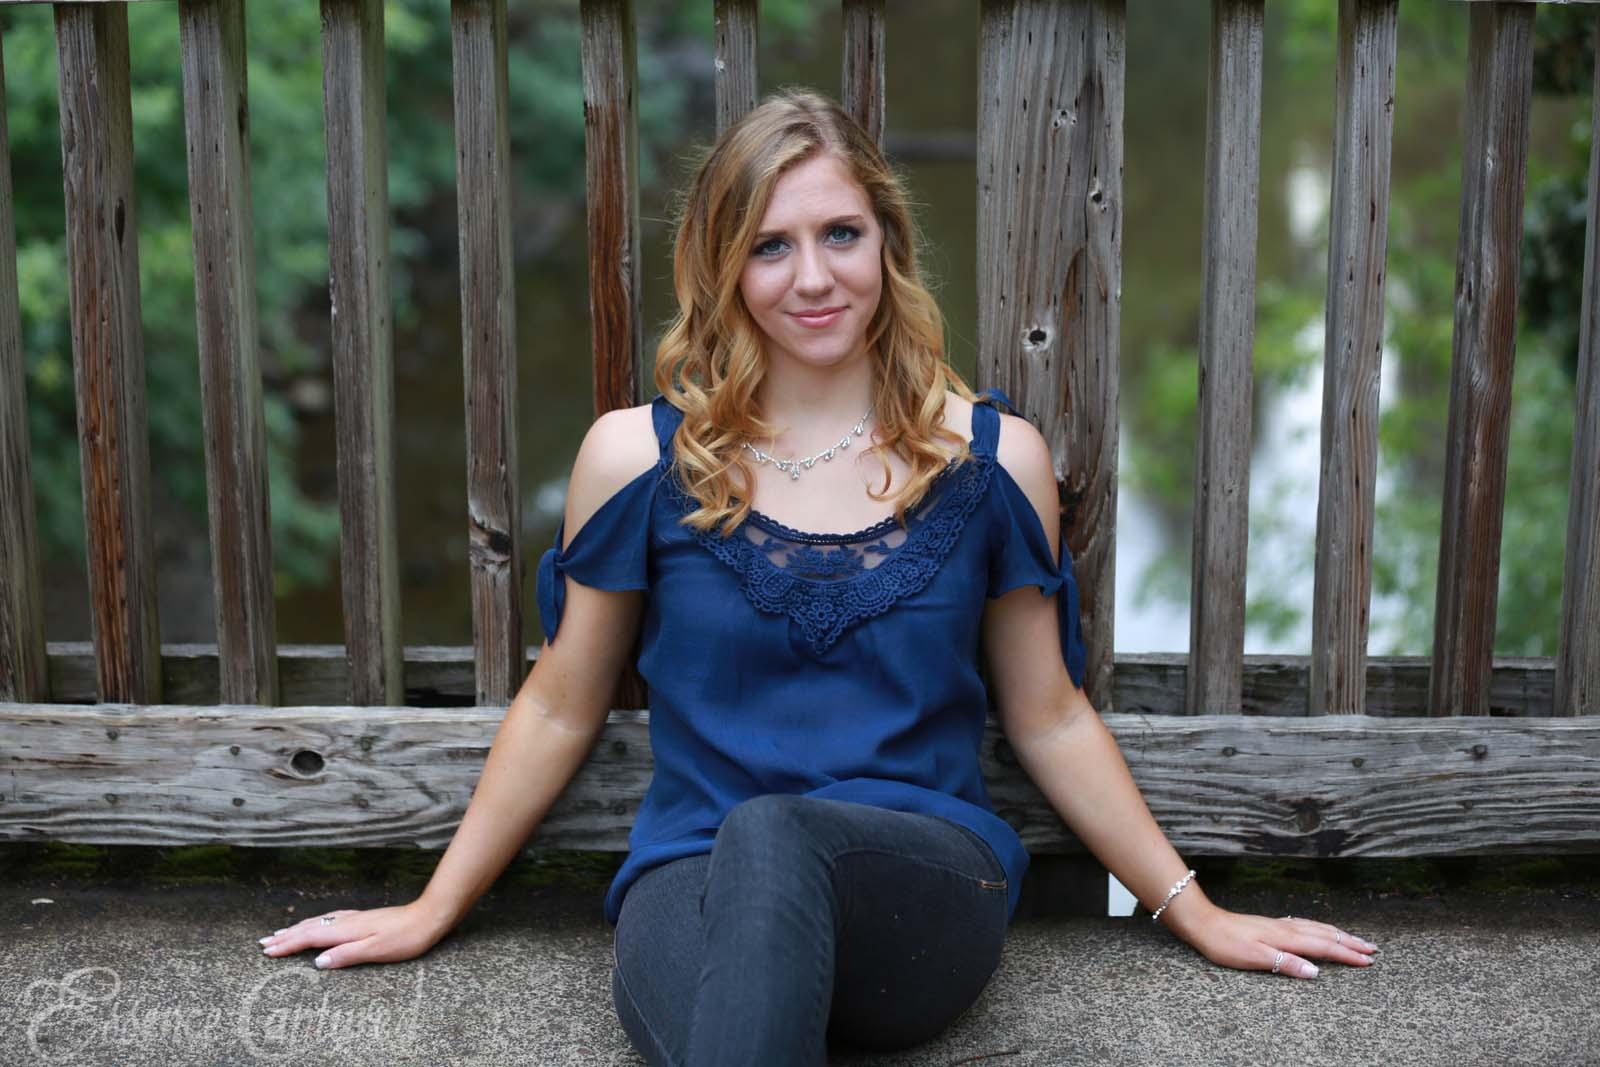 female high school senior portrait blue top long blonde hair sitting on bridge over river